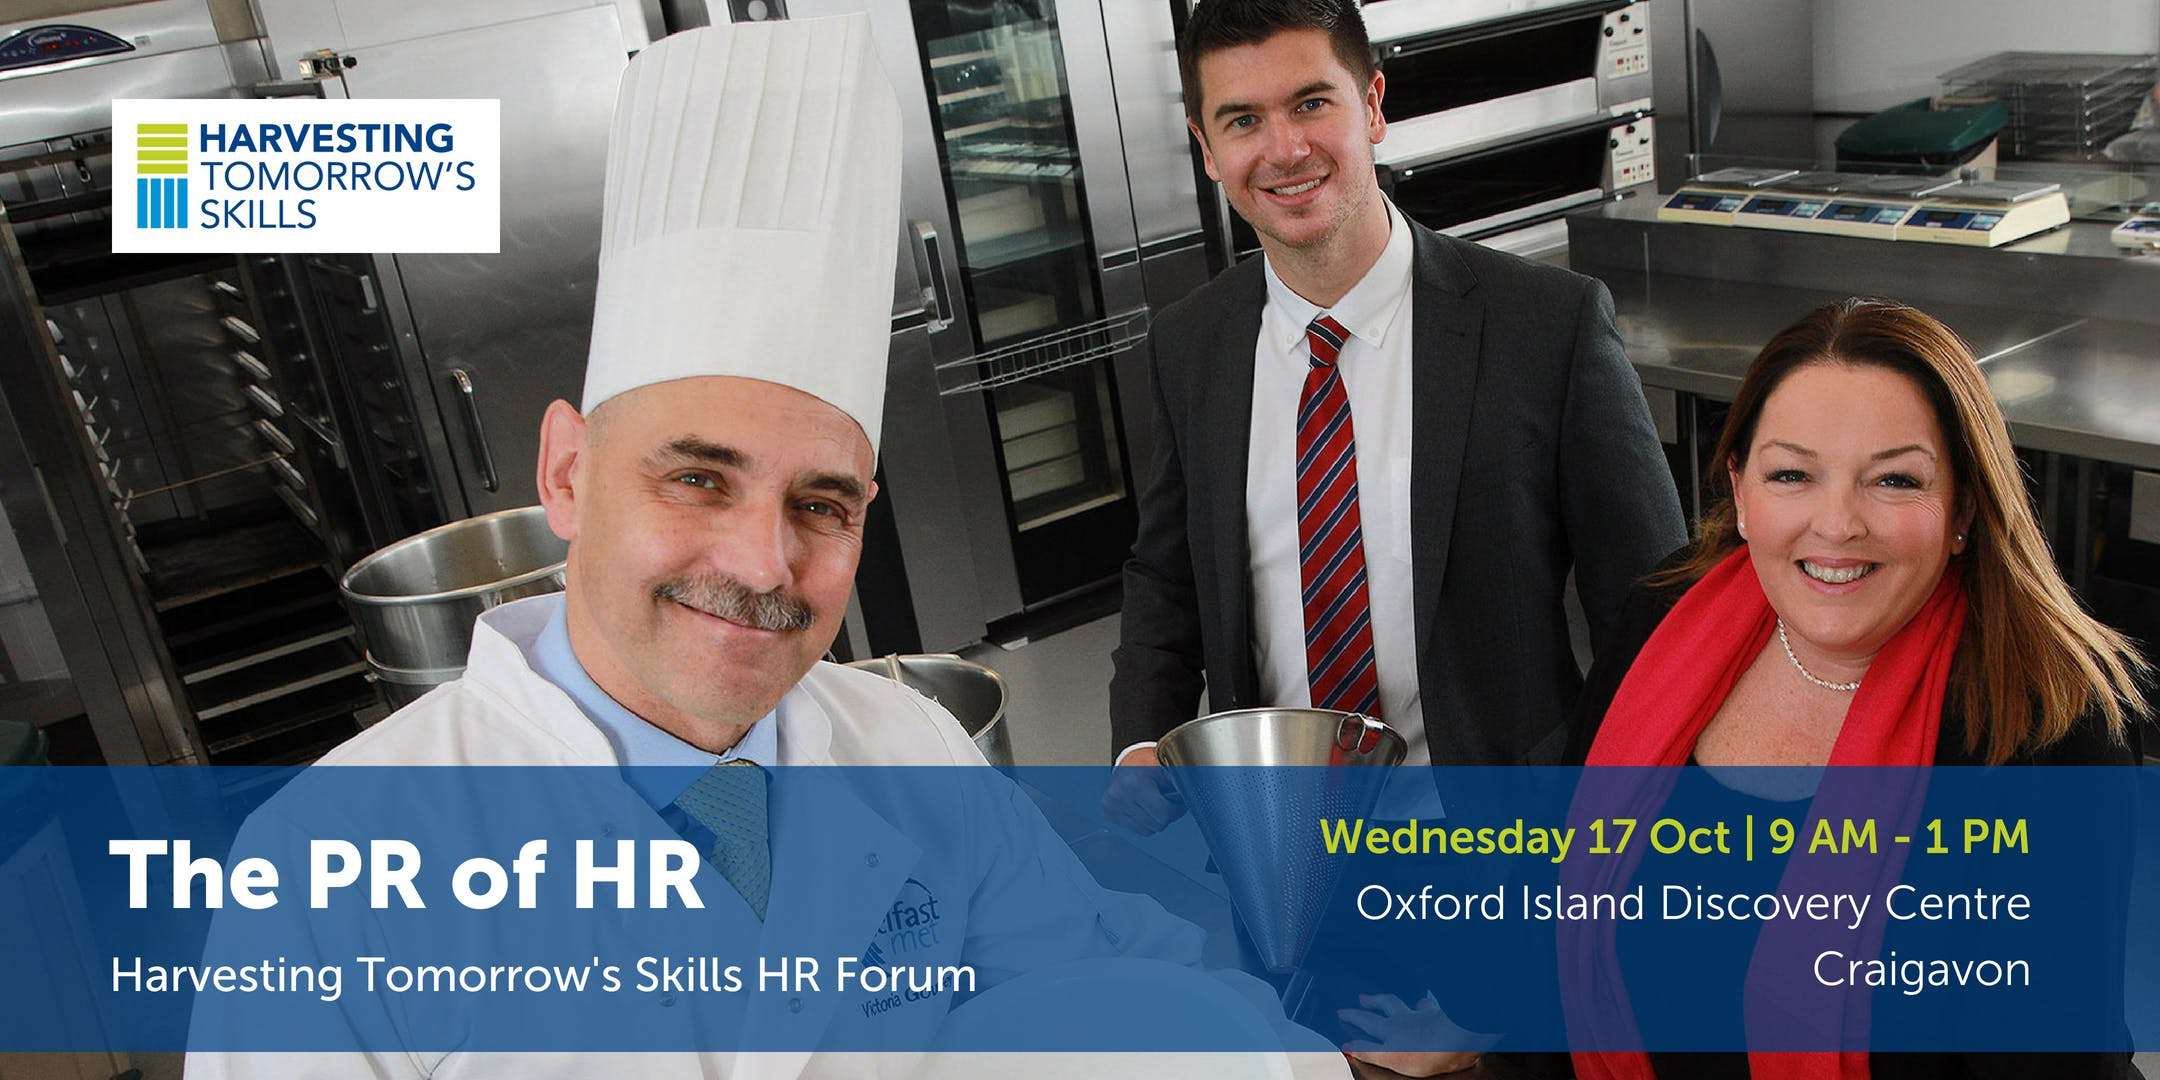 Harvesting Tomorrow's Skills HR Forum